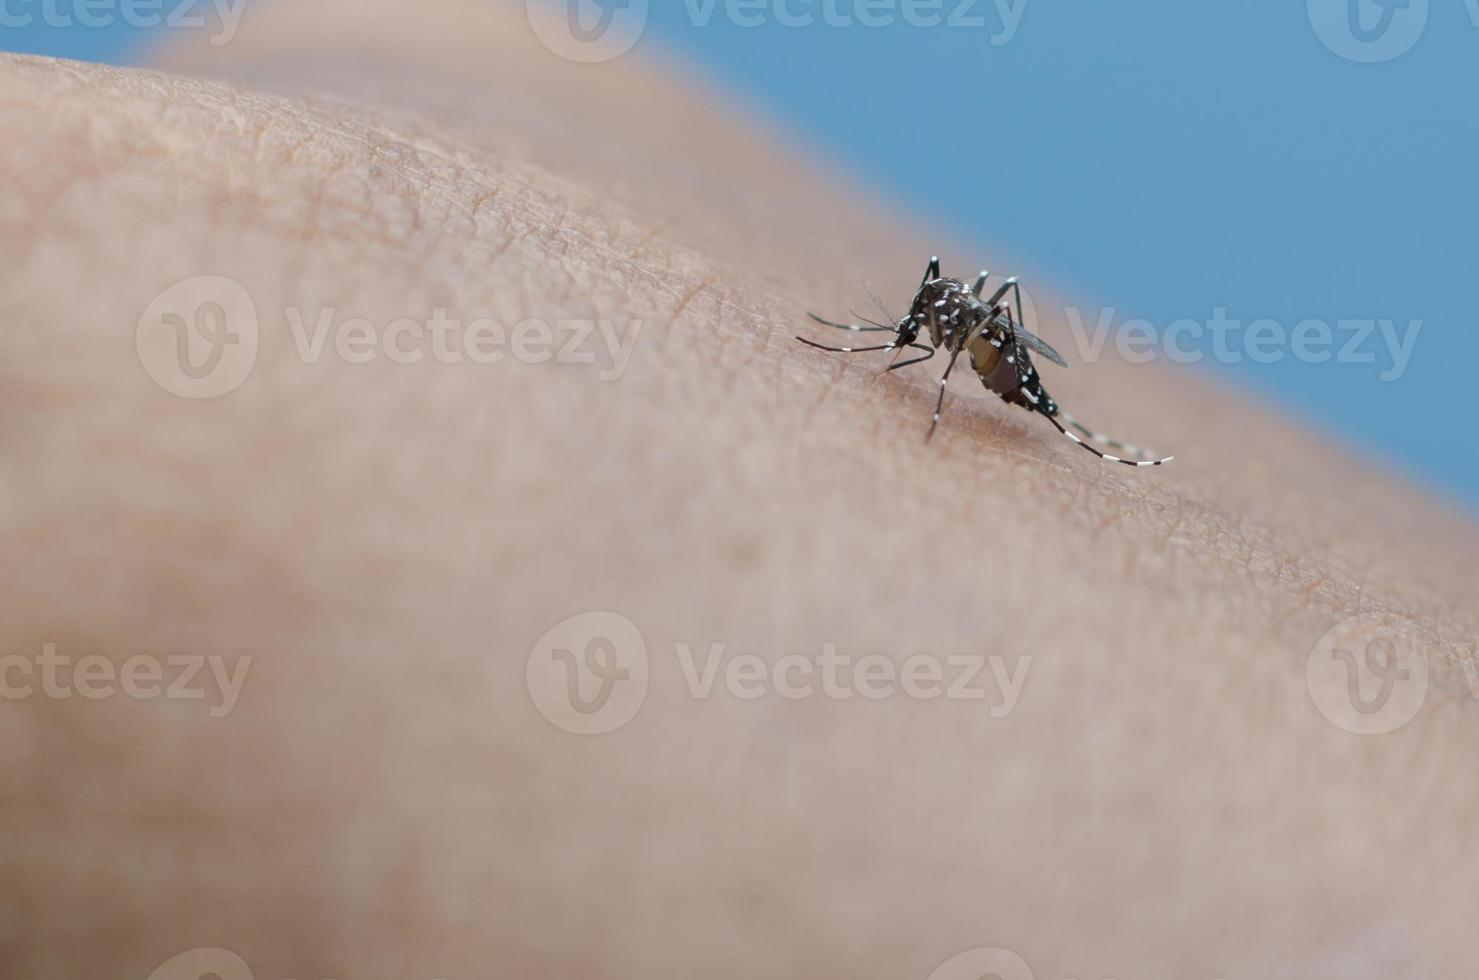 tiger mosquito photo